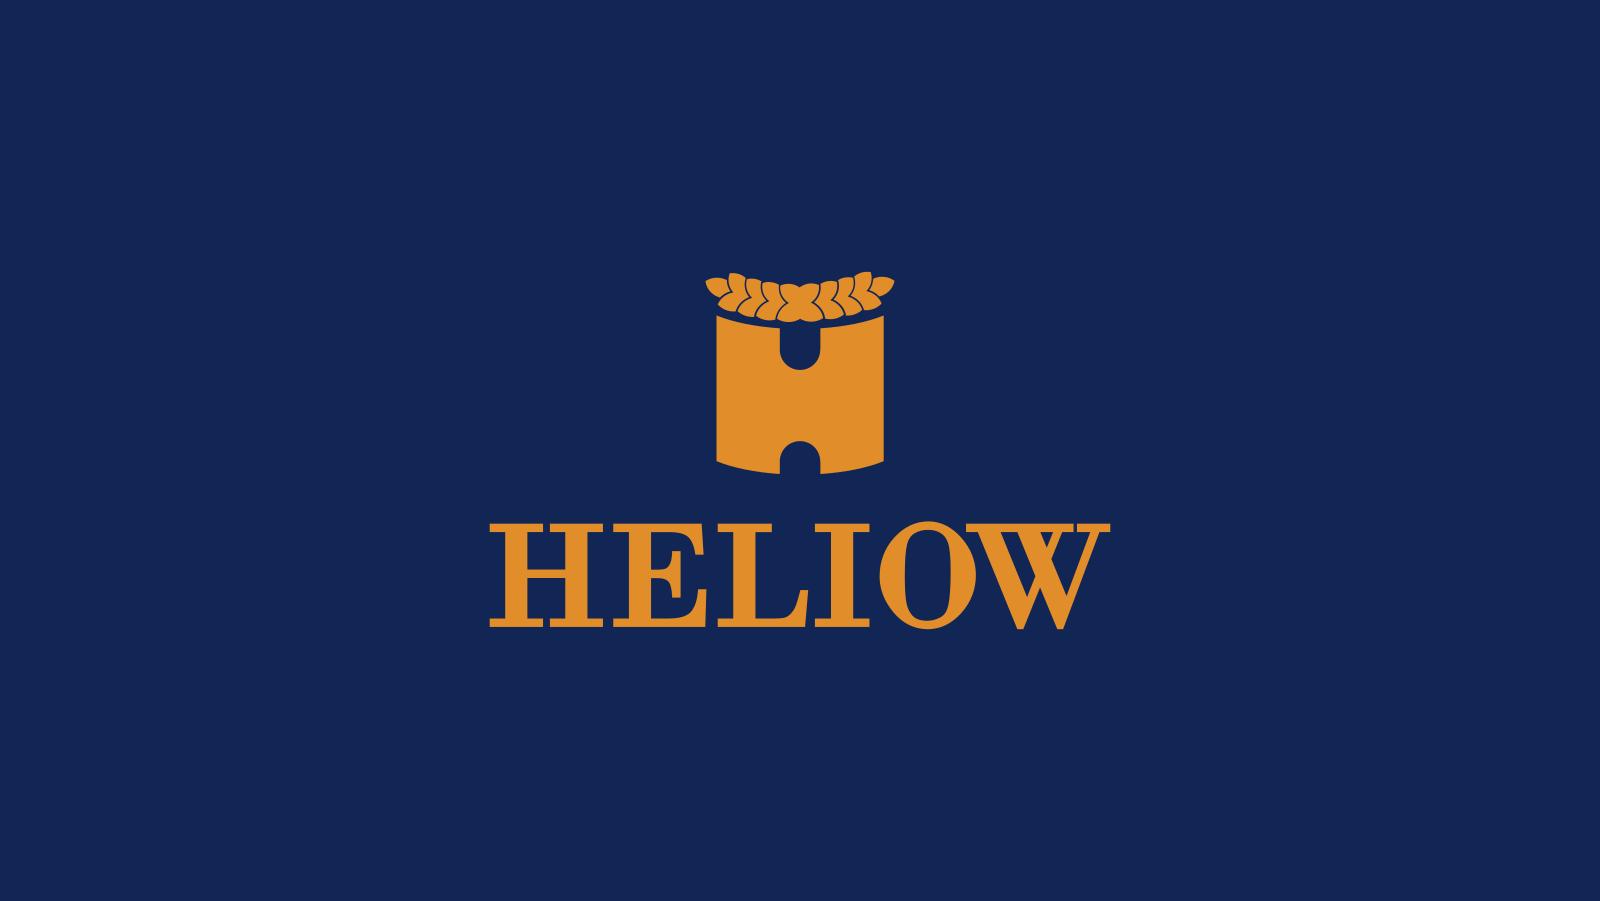 heliow logo